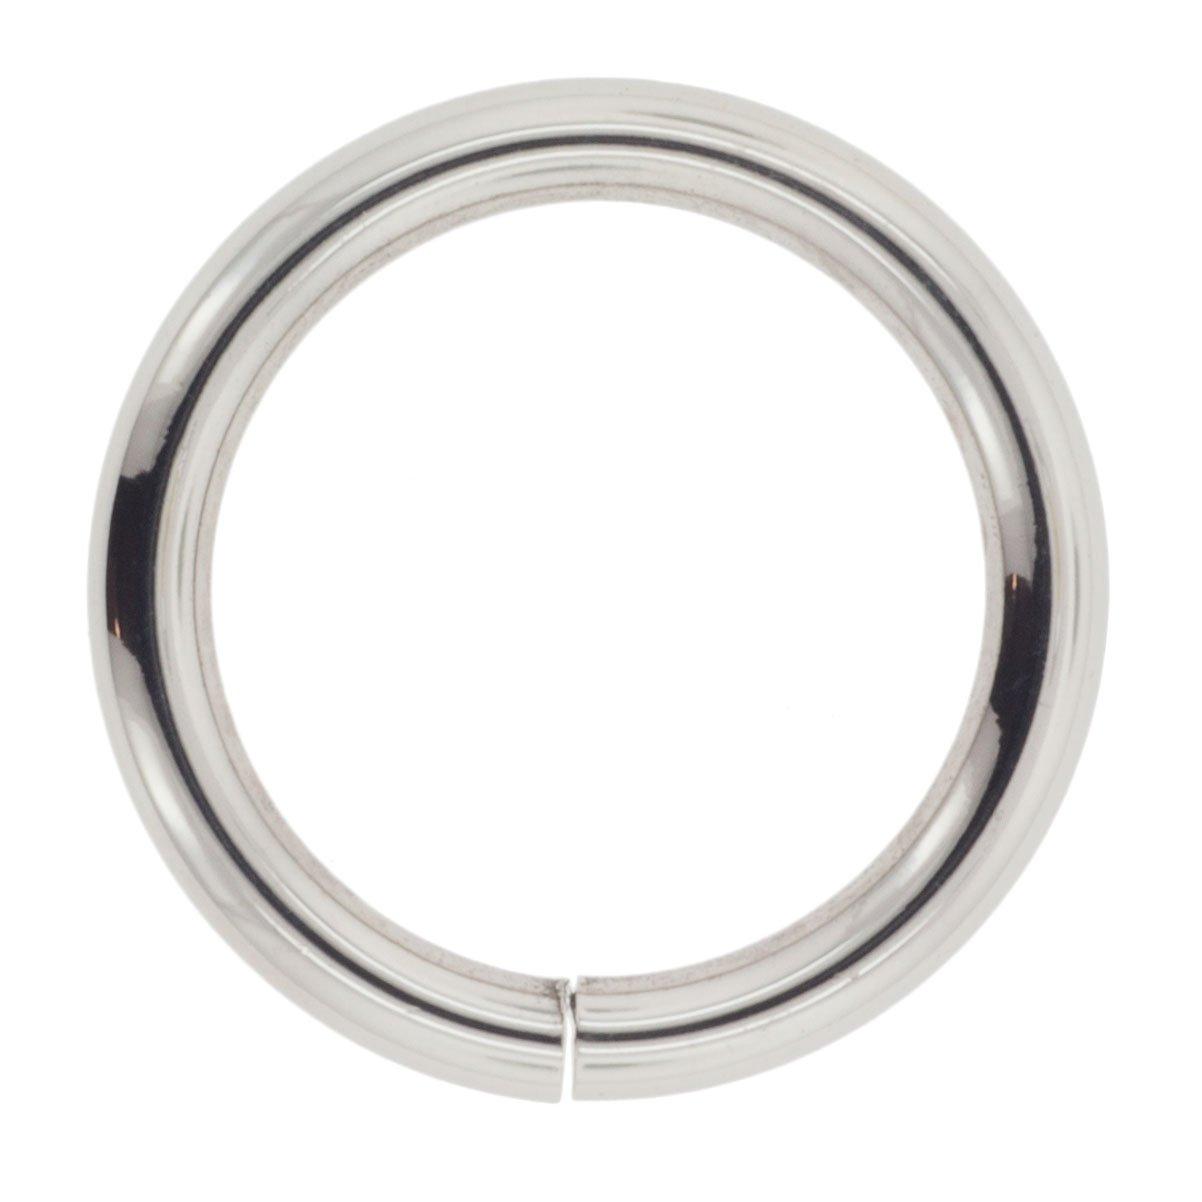 Stainless Steel Seam Ring 12g 7//8